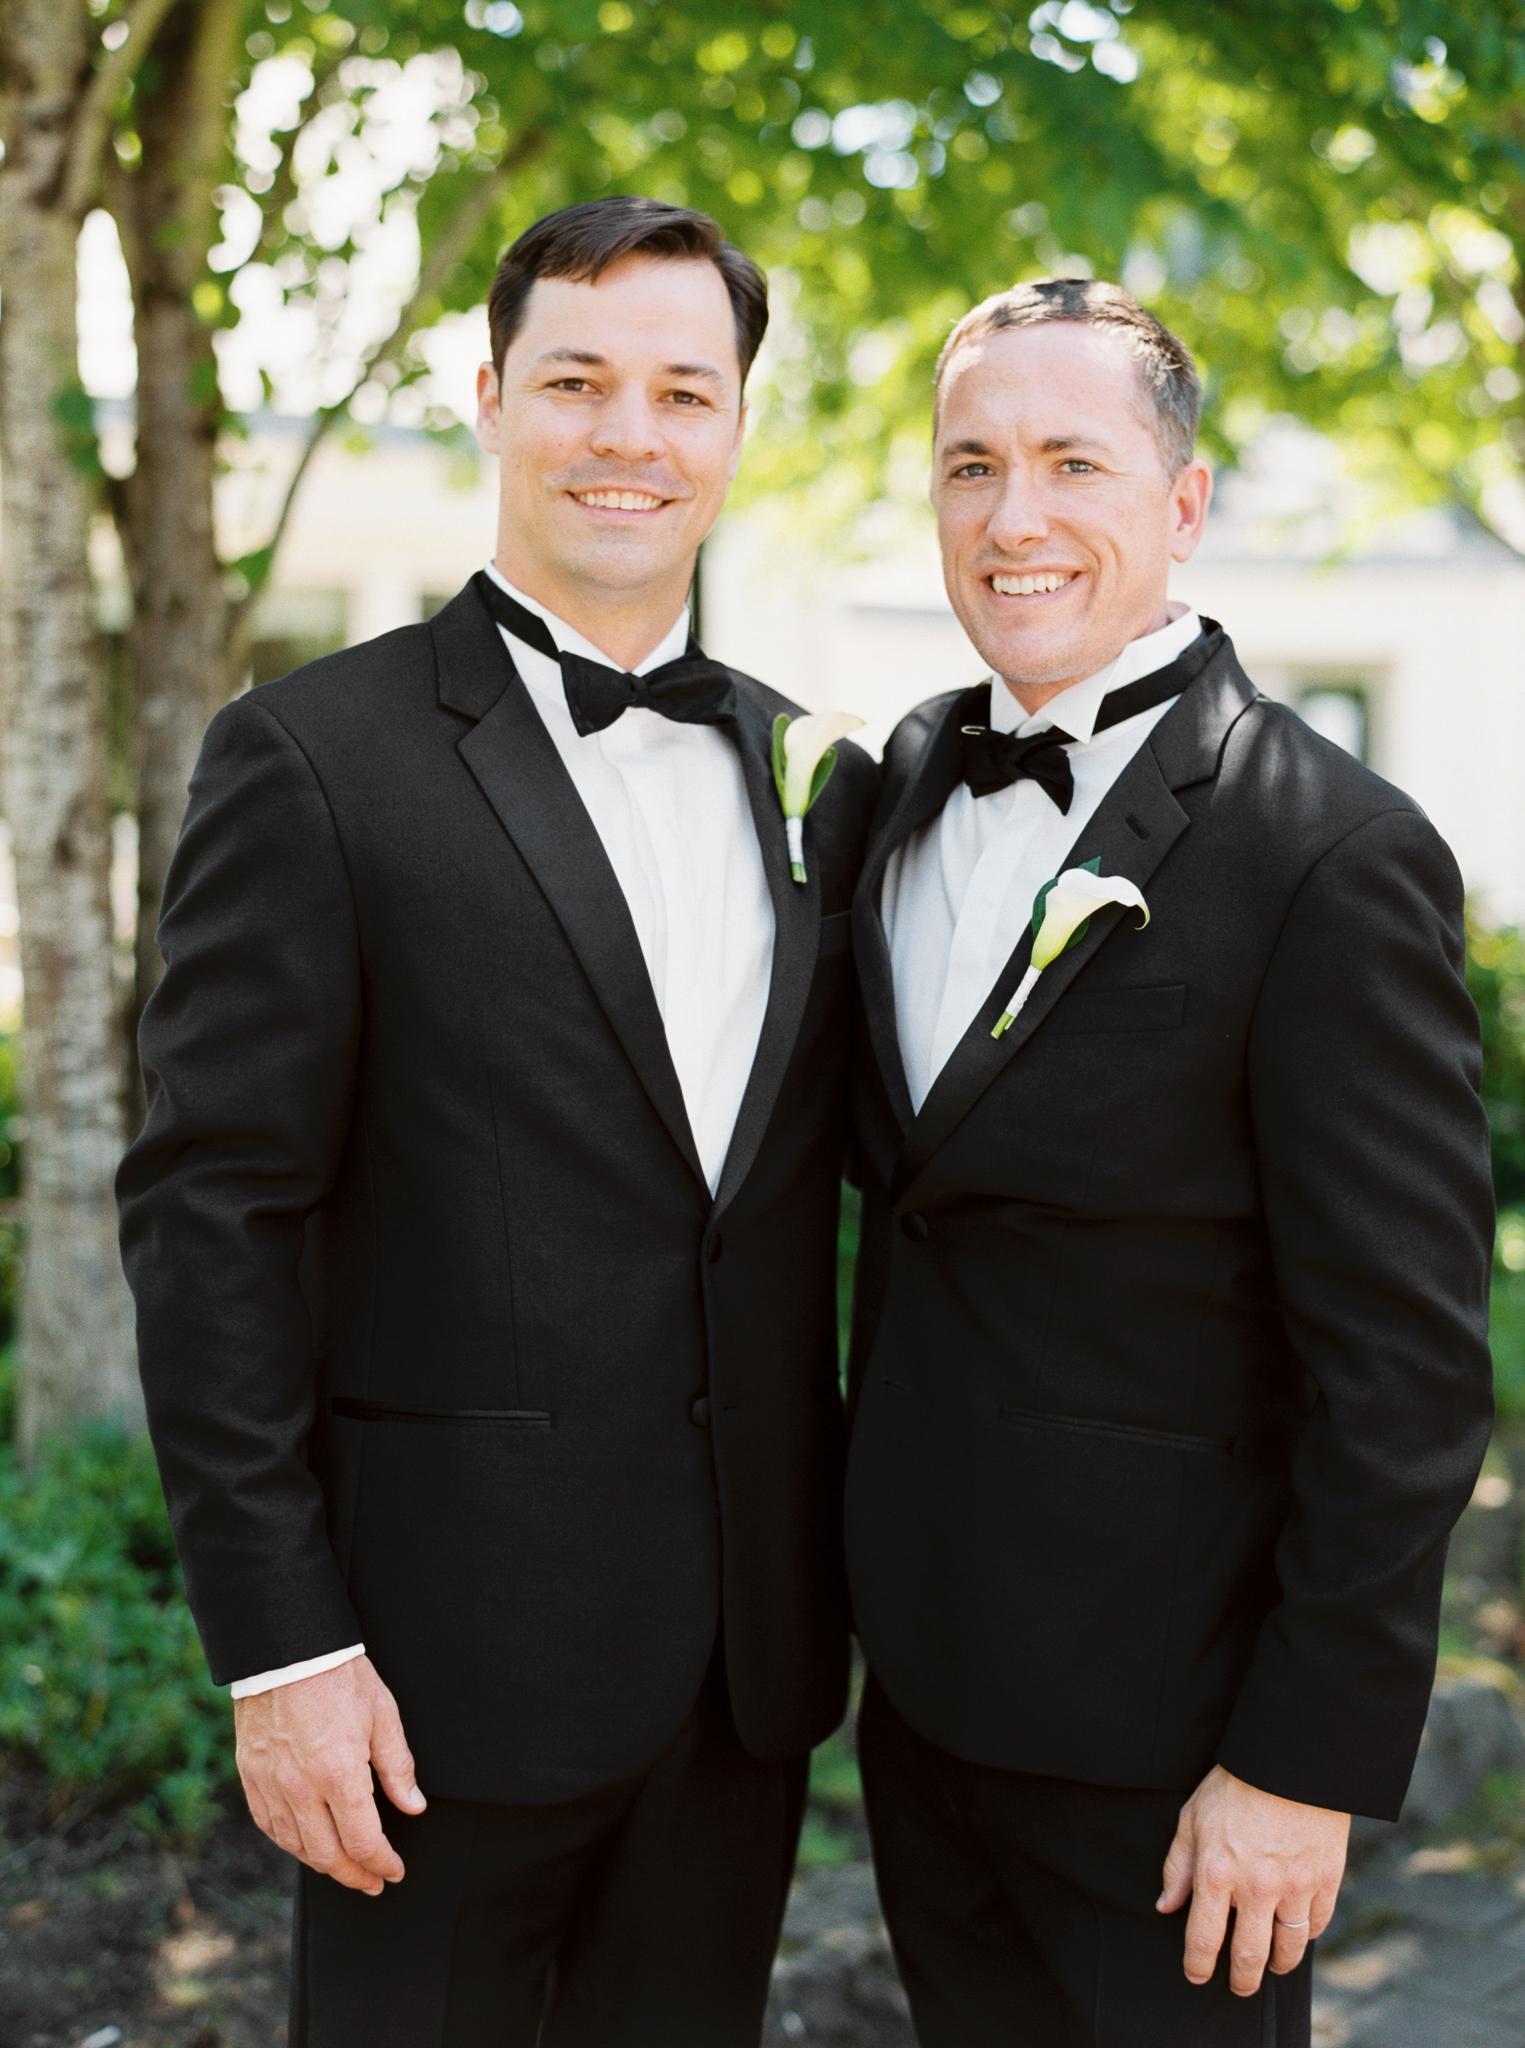 064OutliveCreative_Travel_Photographer_Videographer_Lewis&Clark_Oregon_Elegant_BlackTie_Destination_Wedding.jpg